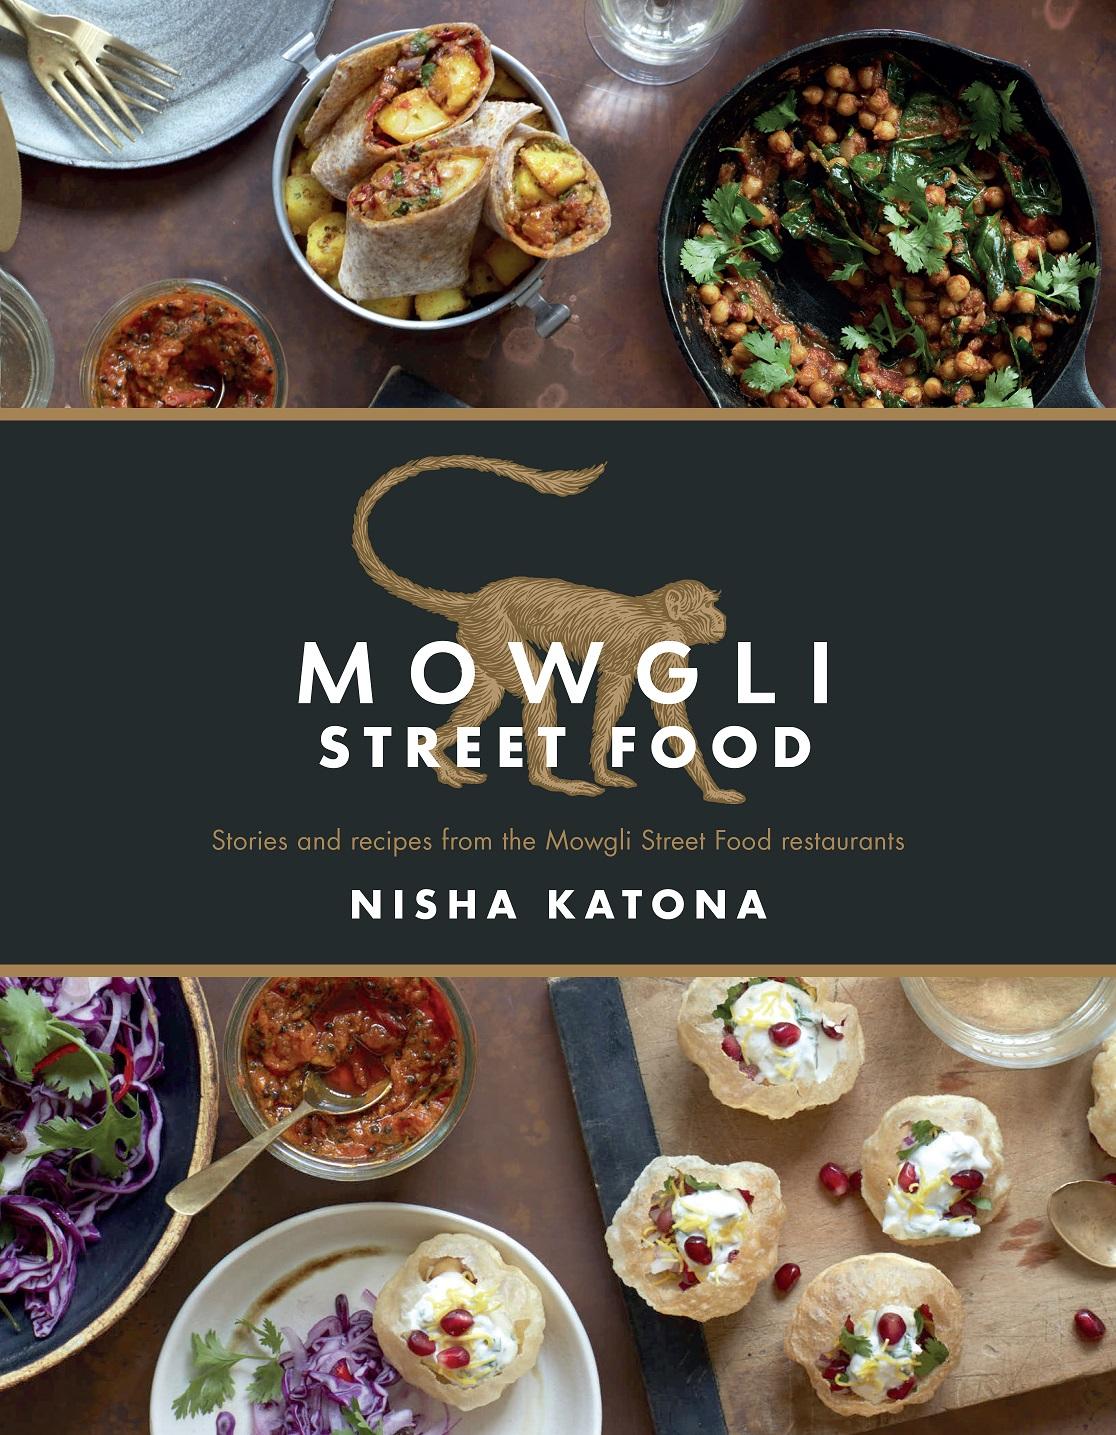 Recipe vegan bunny chow mowgli street food stories and recipes from the mowgli street food restaurants by nisha katona is out now nourish books 2018 hardback 25 forumfinder Image collections